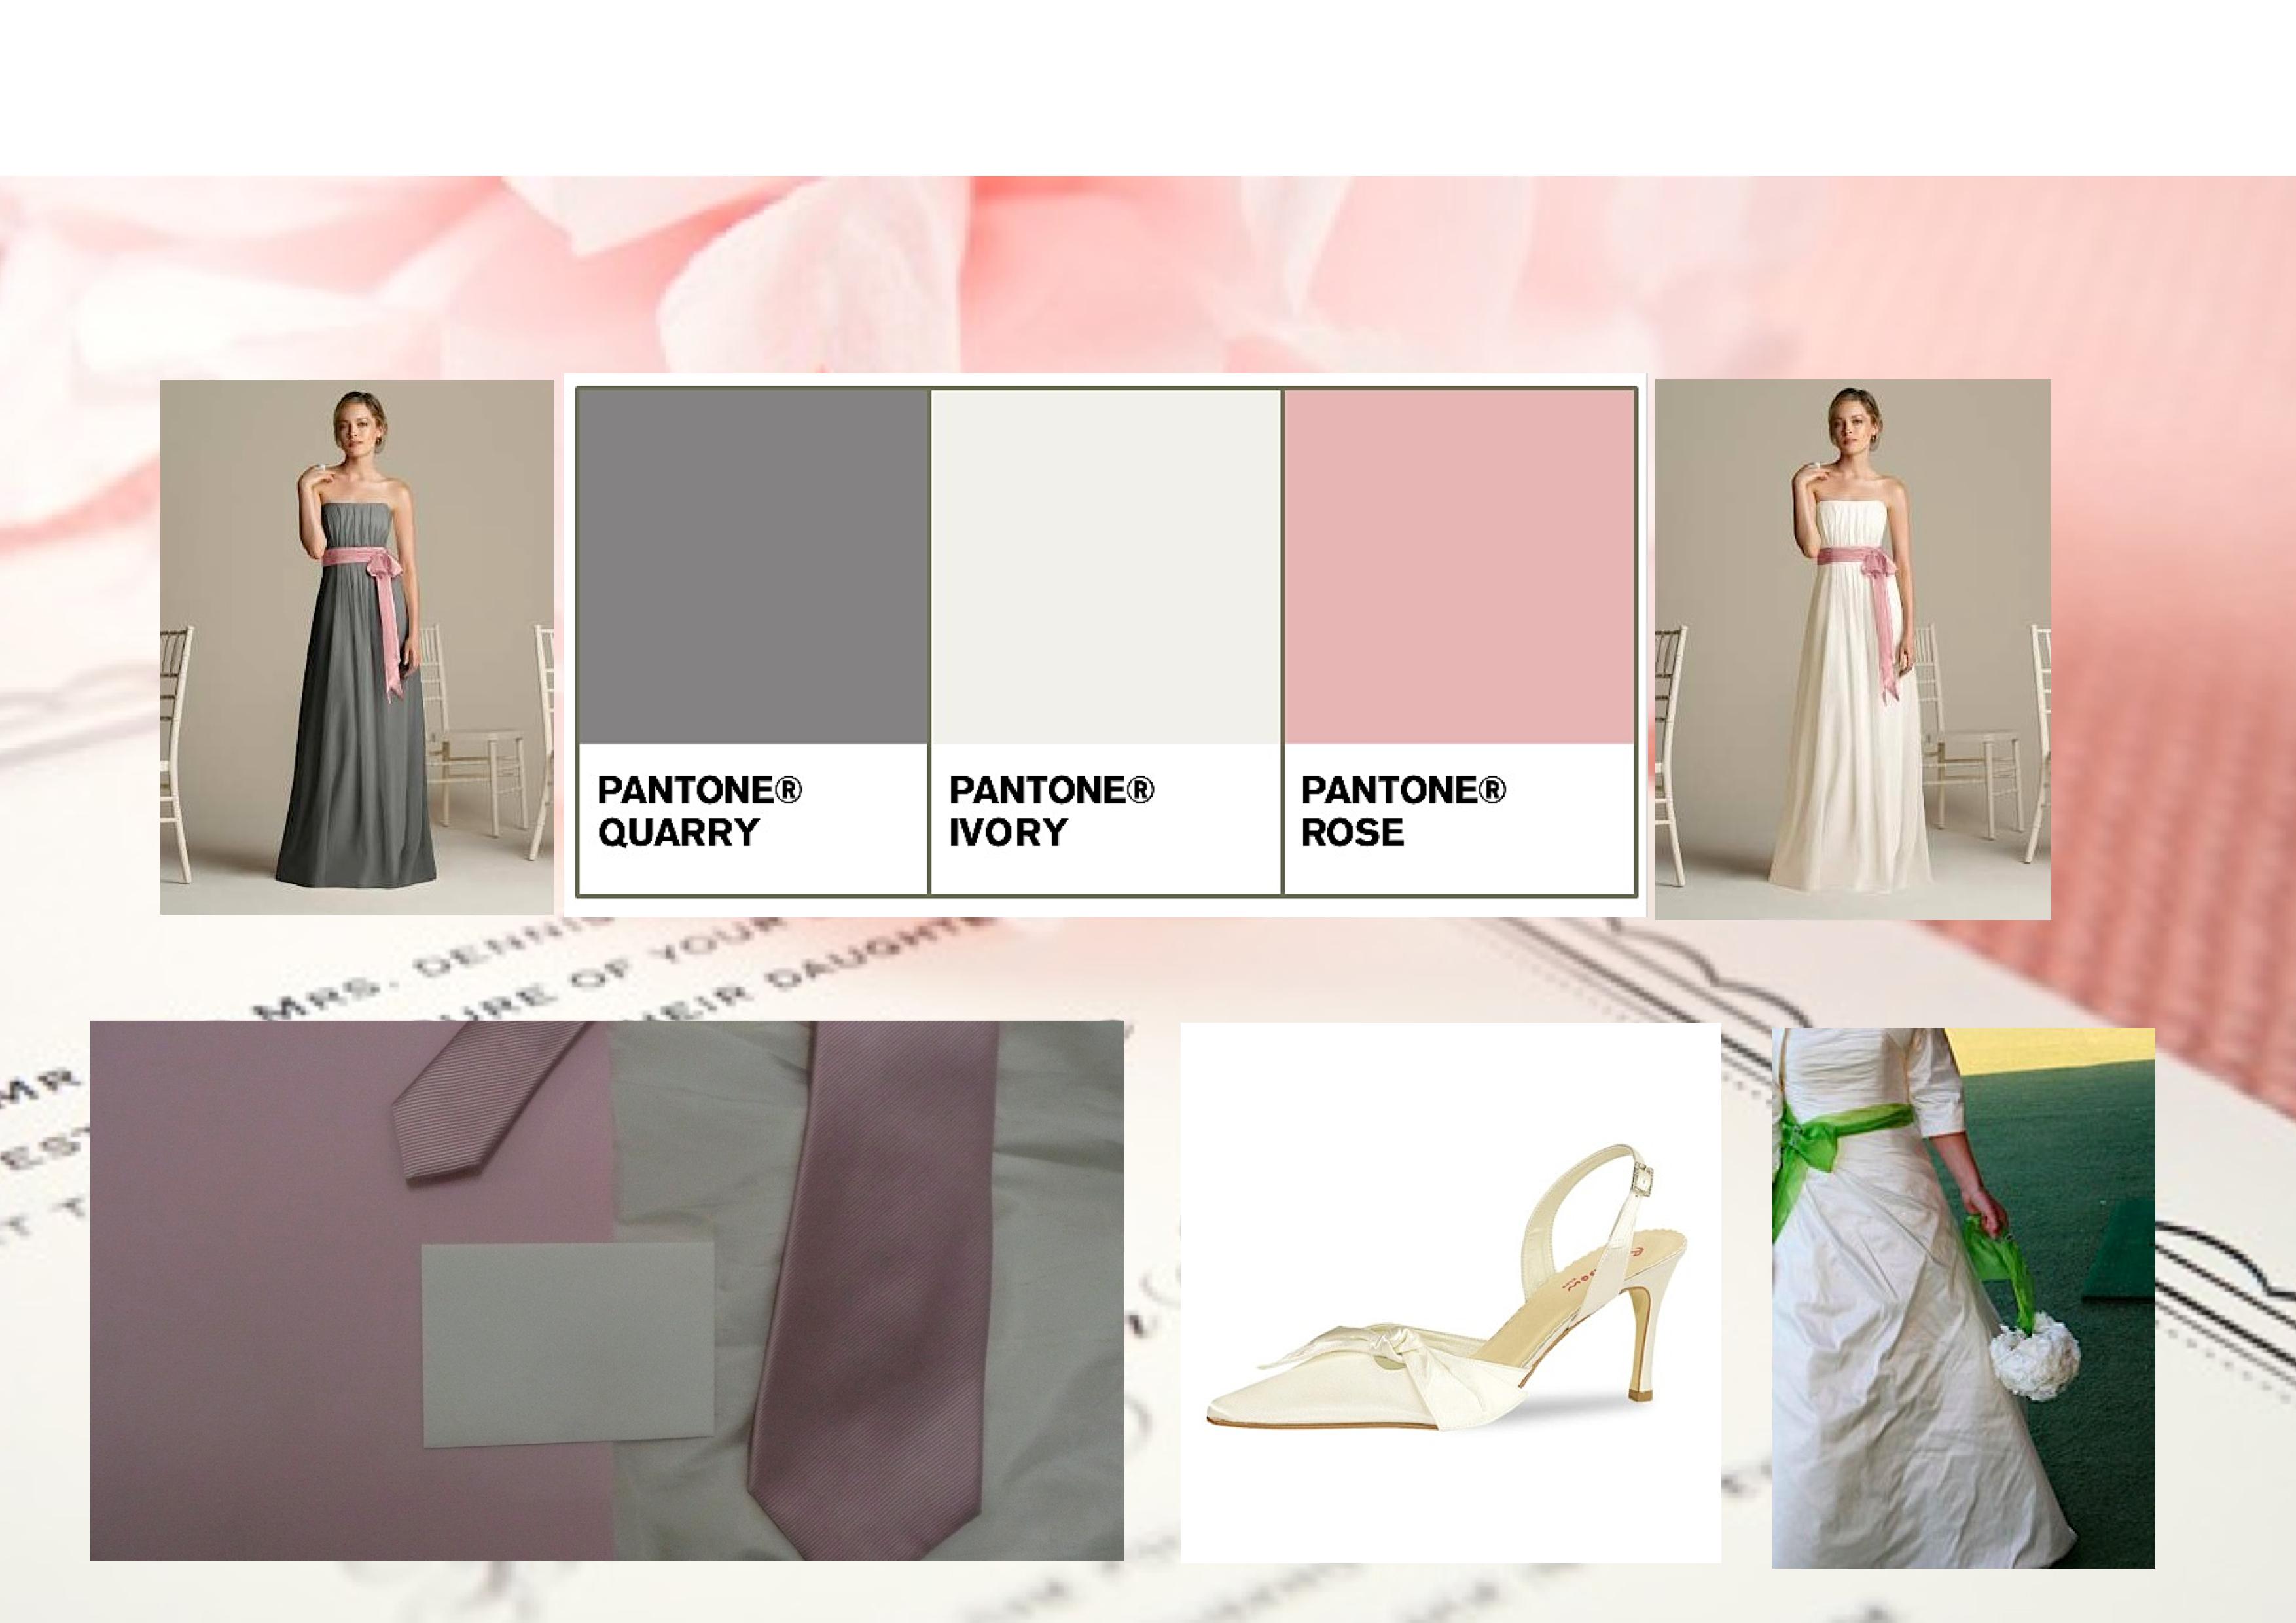 Flowers & Decor, Bridesmaids, Bridesmaids Dresses, Wedding Dresses, Shoes, Fashion, white, pink, silver, dress, Bridesmaid Bouquets, Flowers, Flower Wedding Dresses